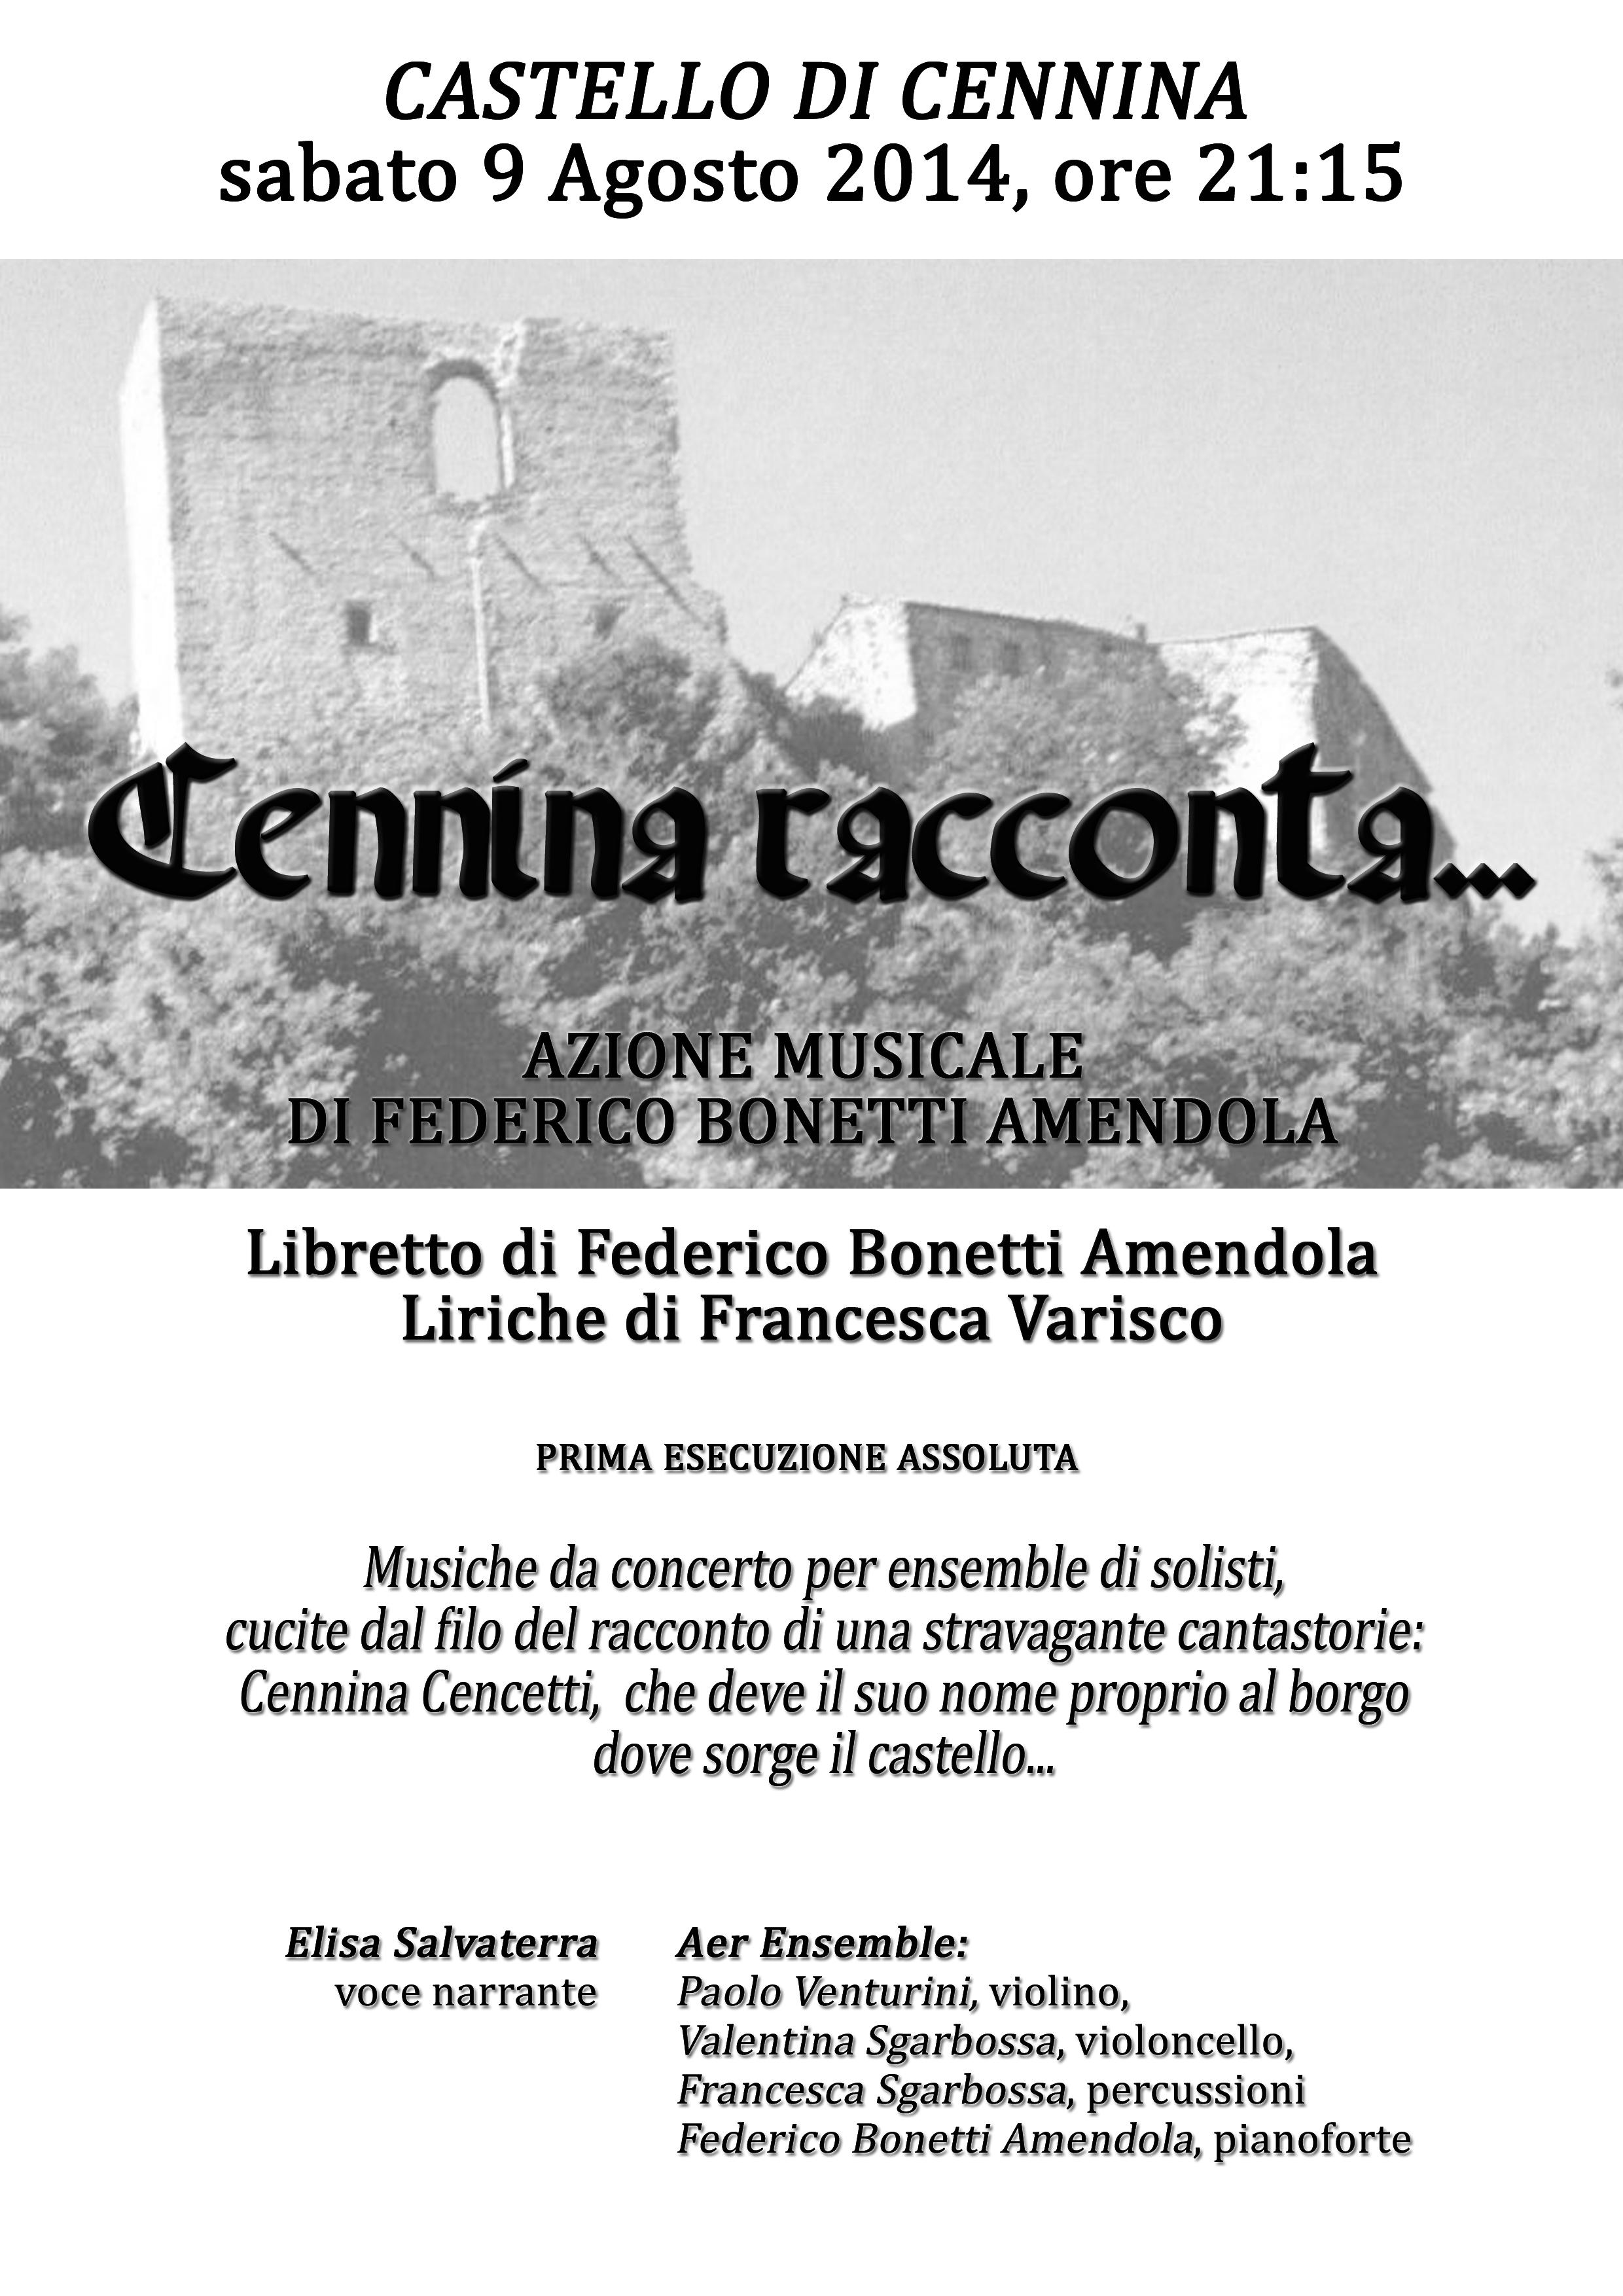 CENNINA RACCONTA 2014-08-09 locandina